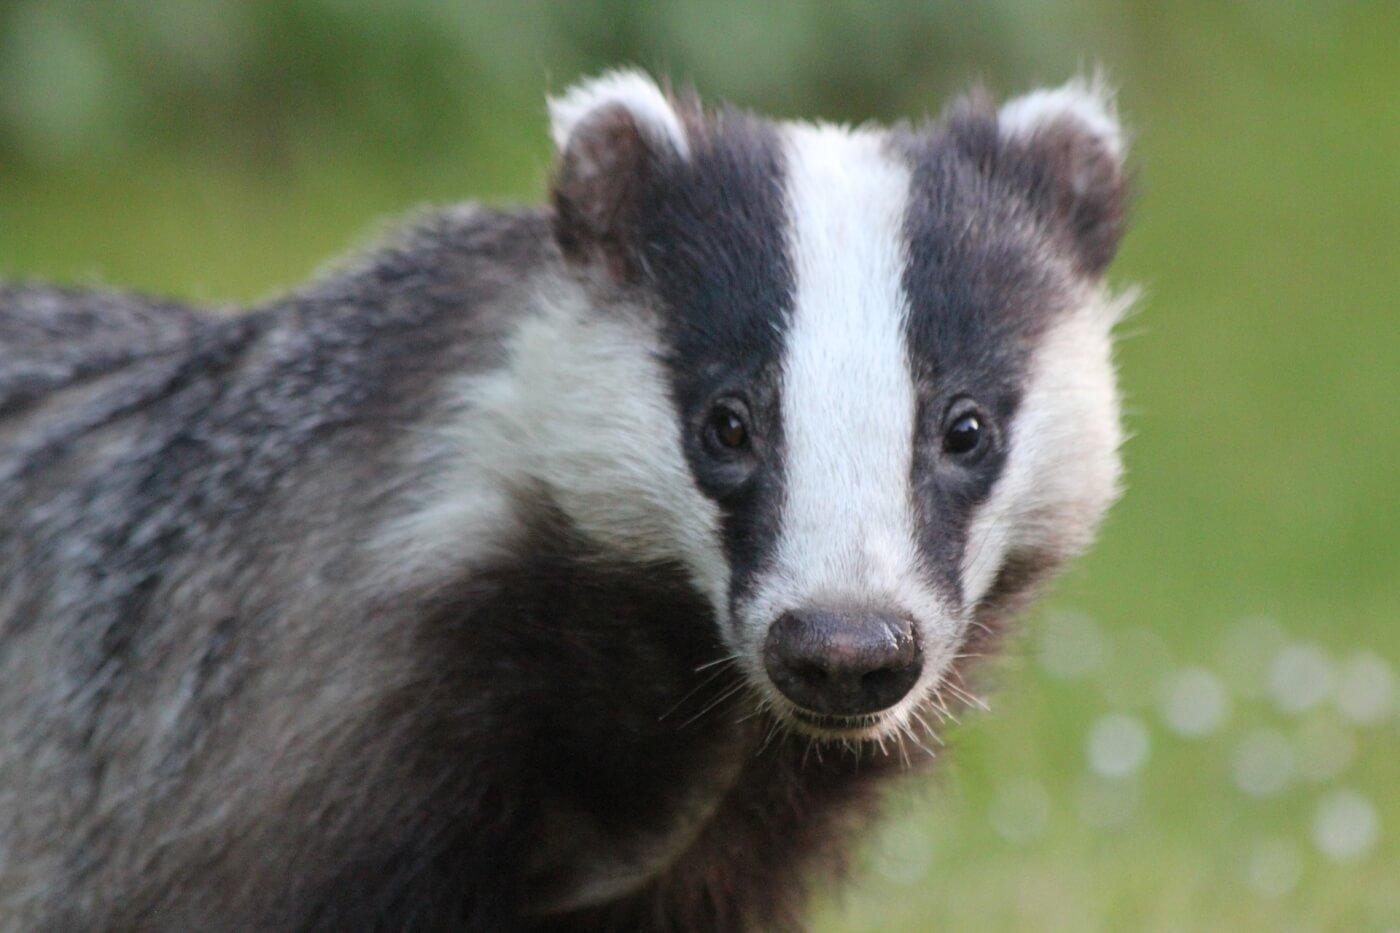 badger photo for loreal badger brush ban victory blog